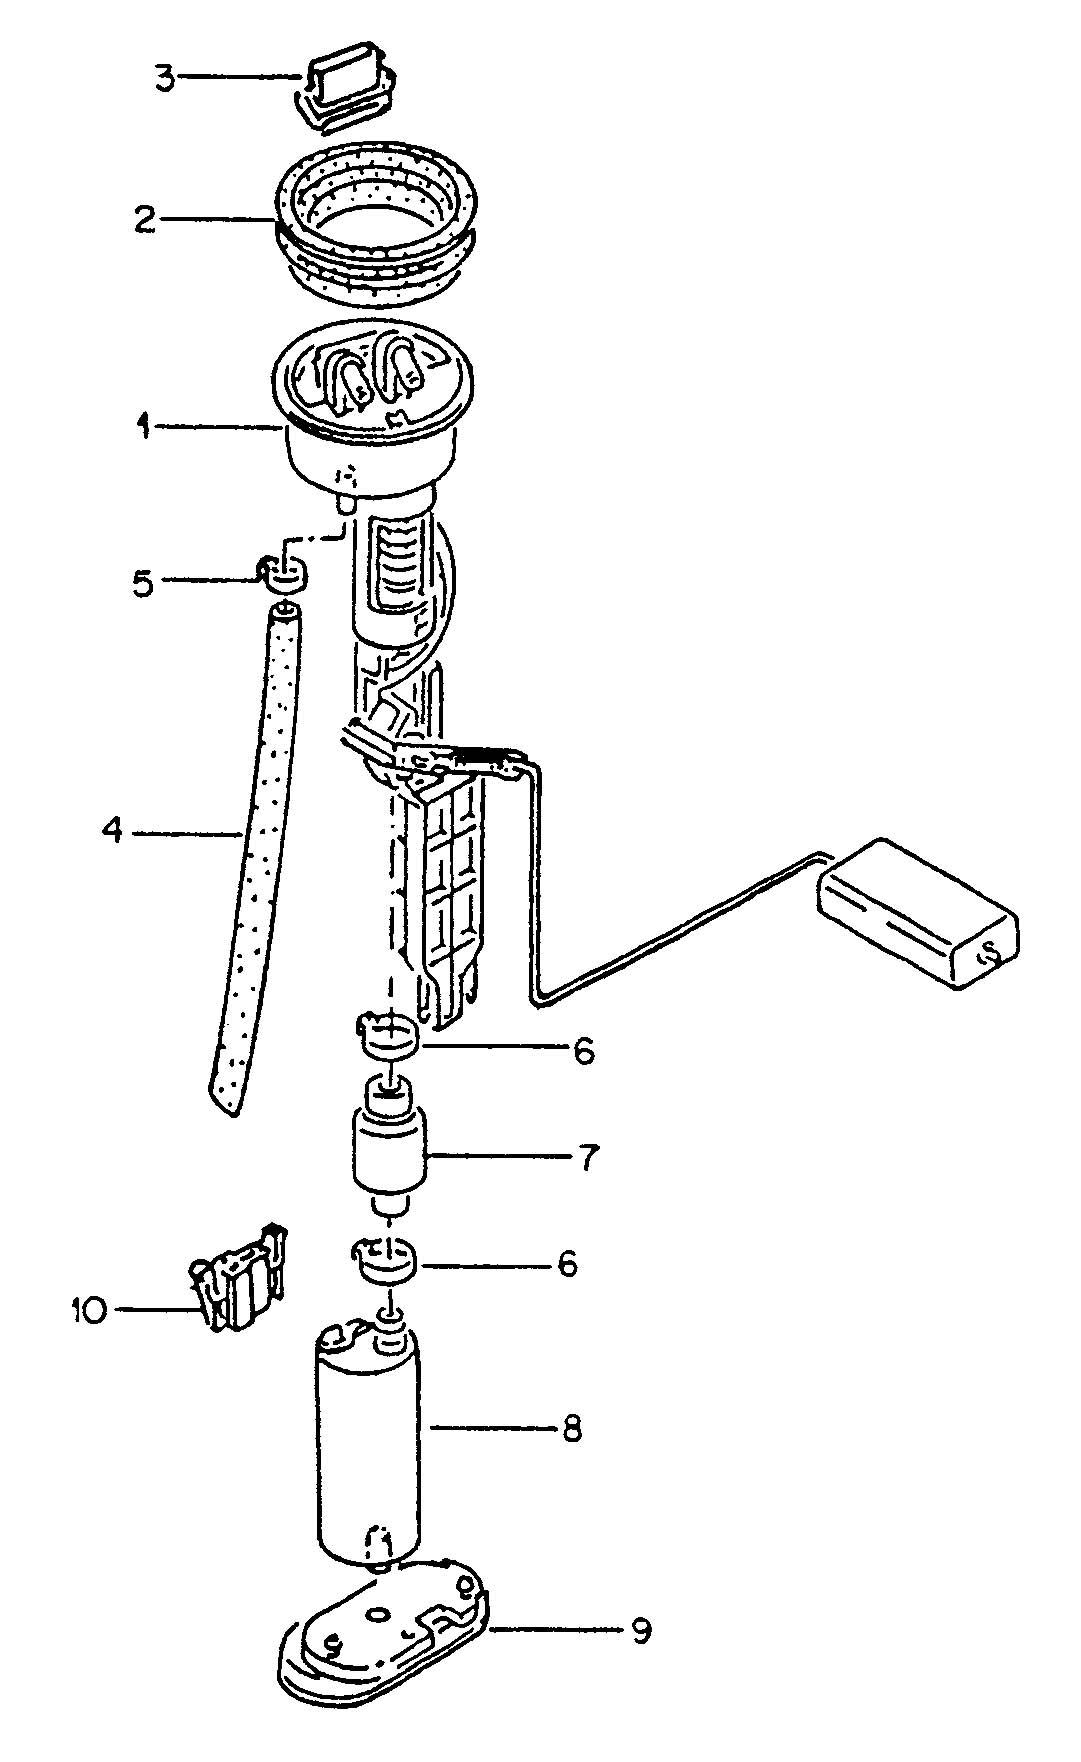 fuel gauge sending unit wiring diagram 1995 jeep wrangler radio 3 wire sender free engine image for user